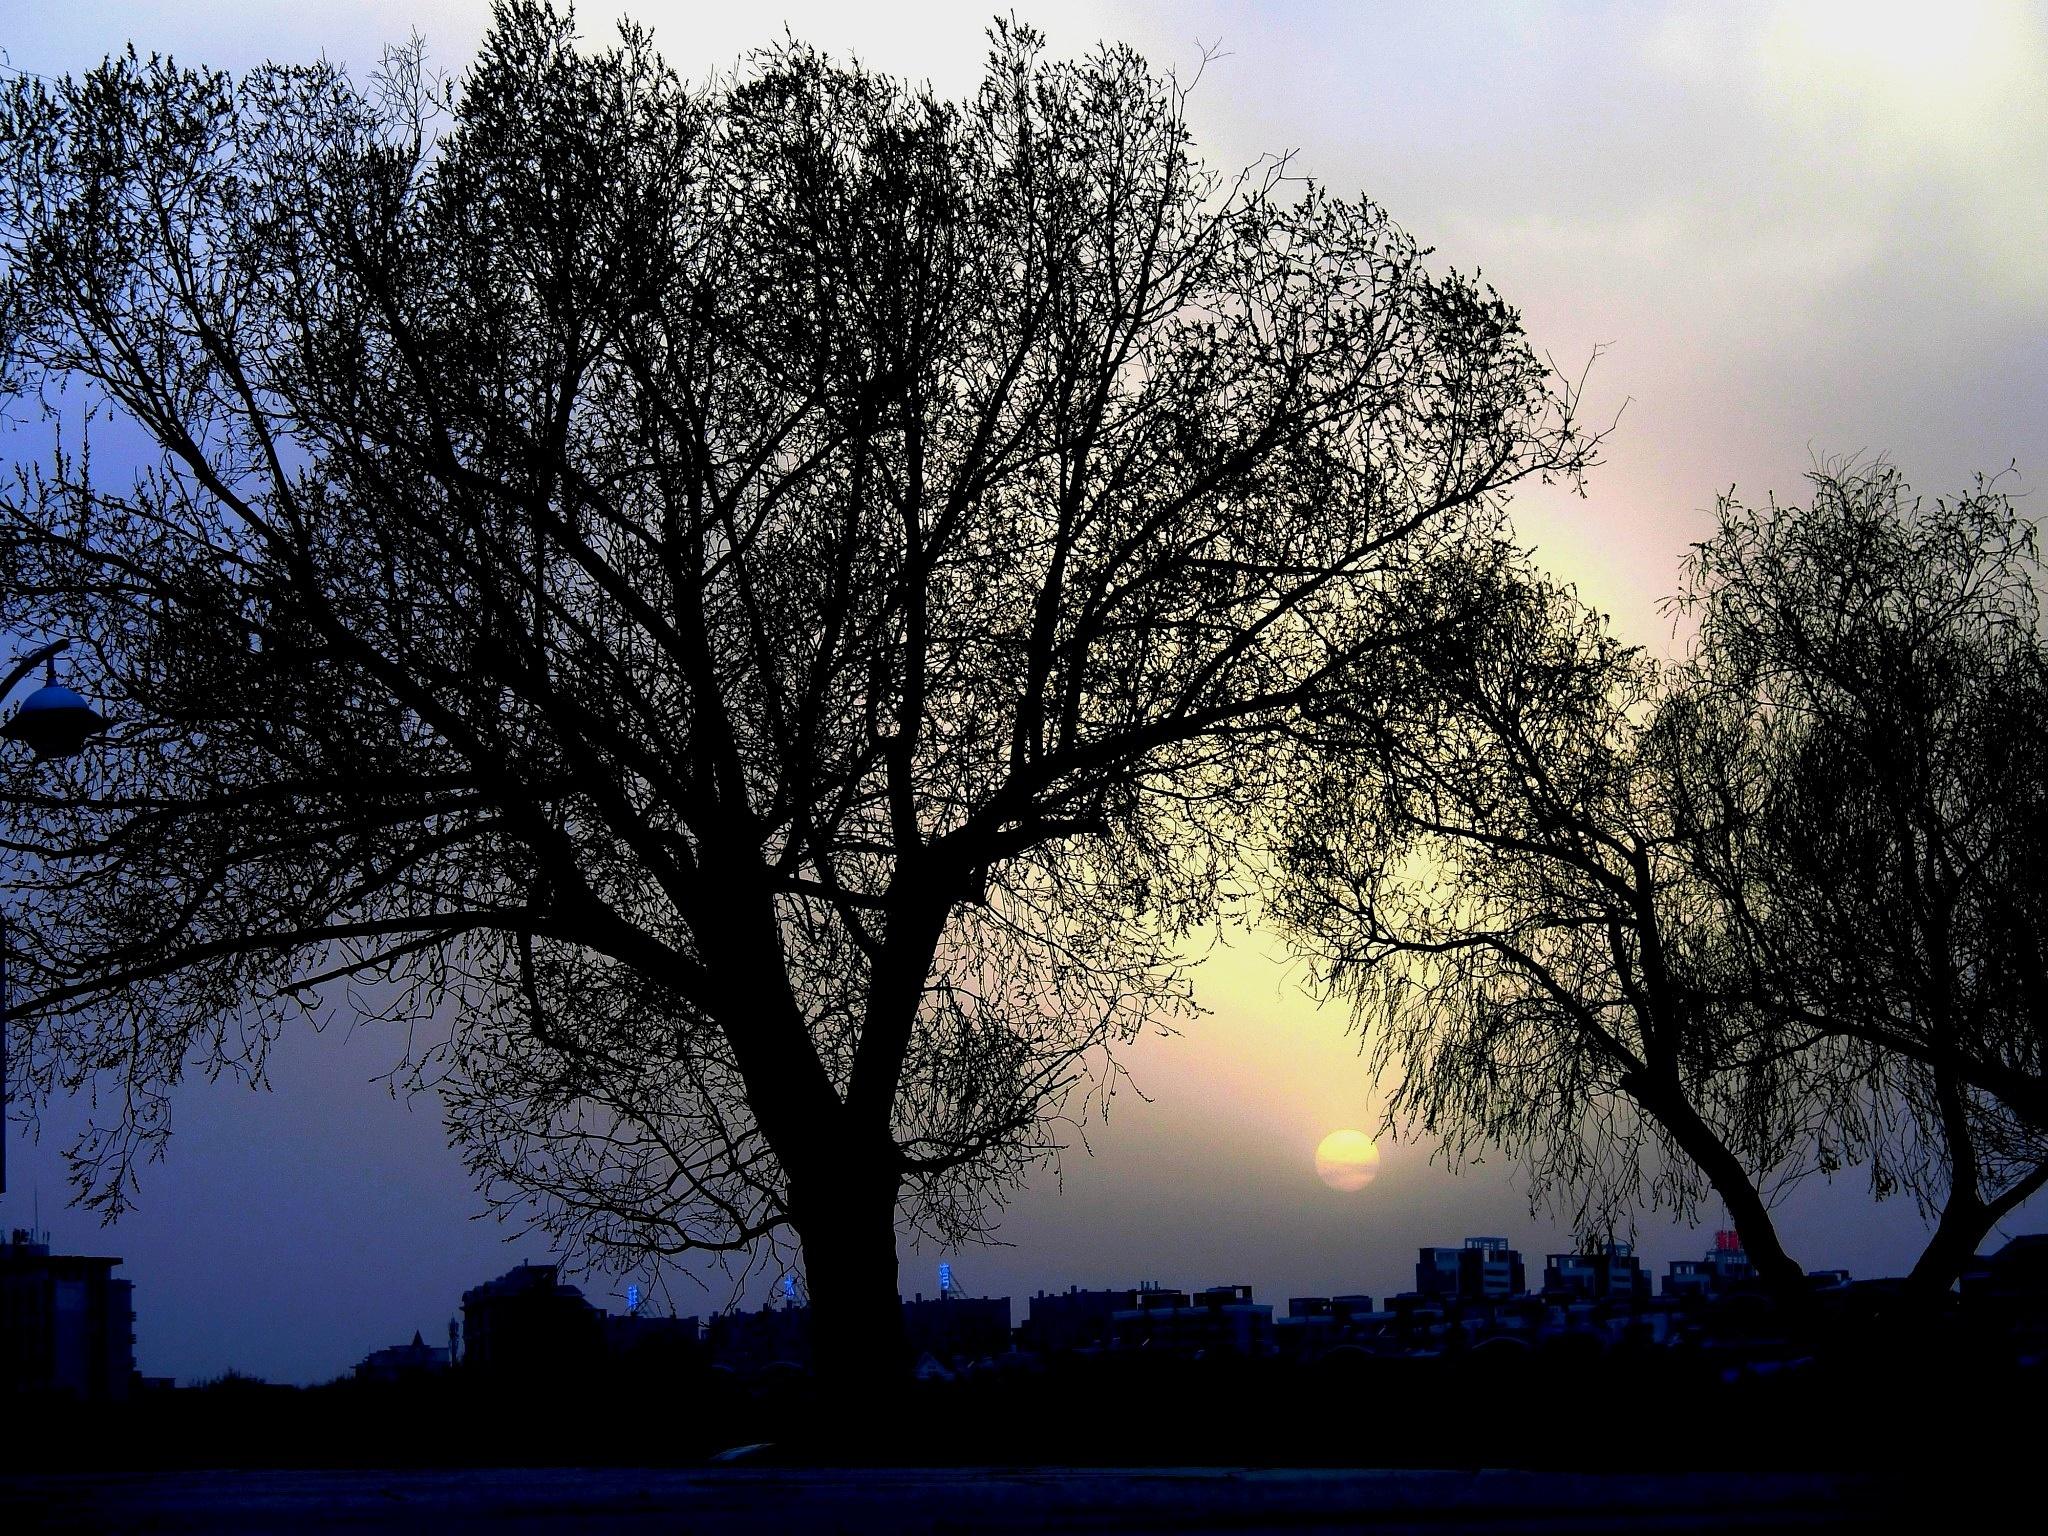 Sunset at Jilin, NE China by pop88123